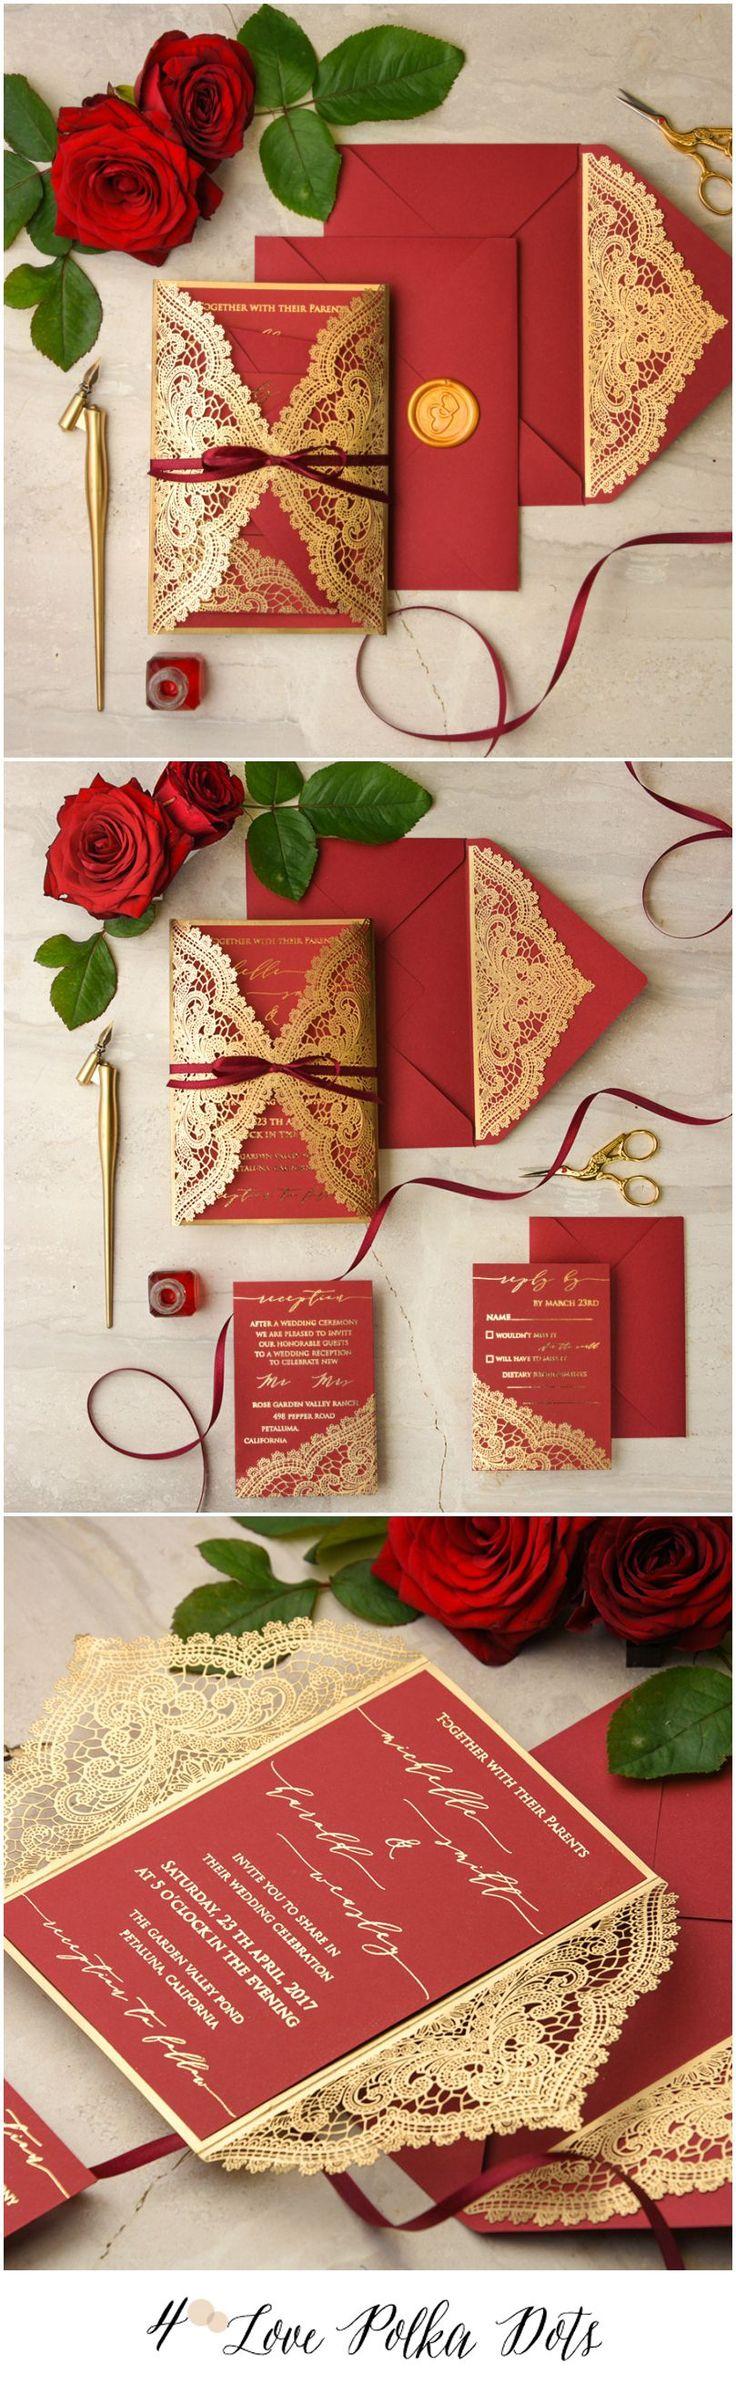 sunflower wedding invitations printable%0A Red  u     Gold laser cut lace romantic wedding invitations  sponsored